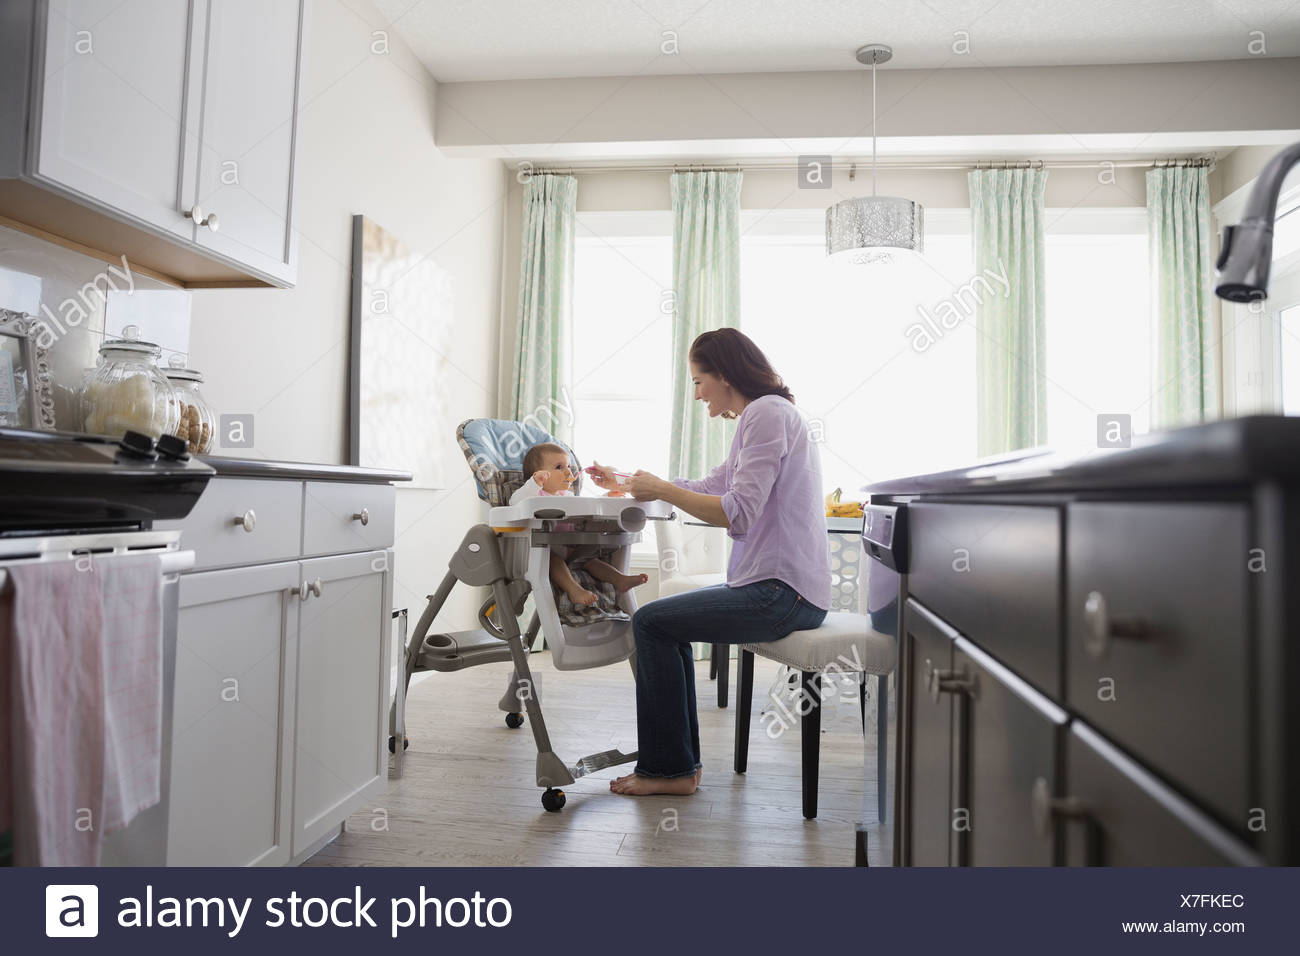 Woman feeding baby girl at home - Stock Image